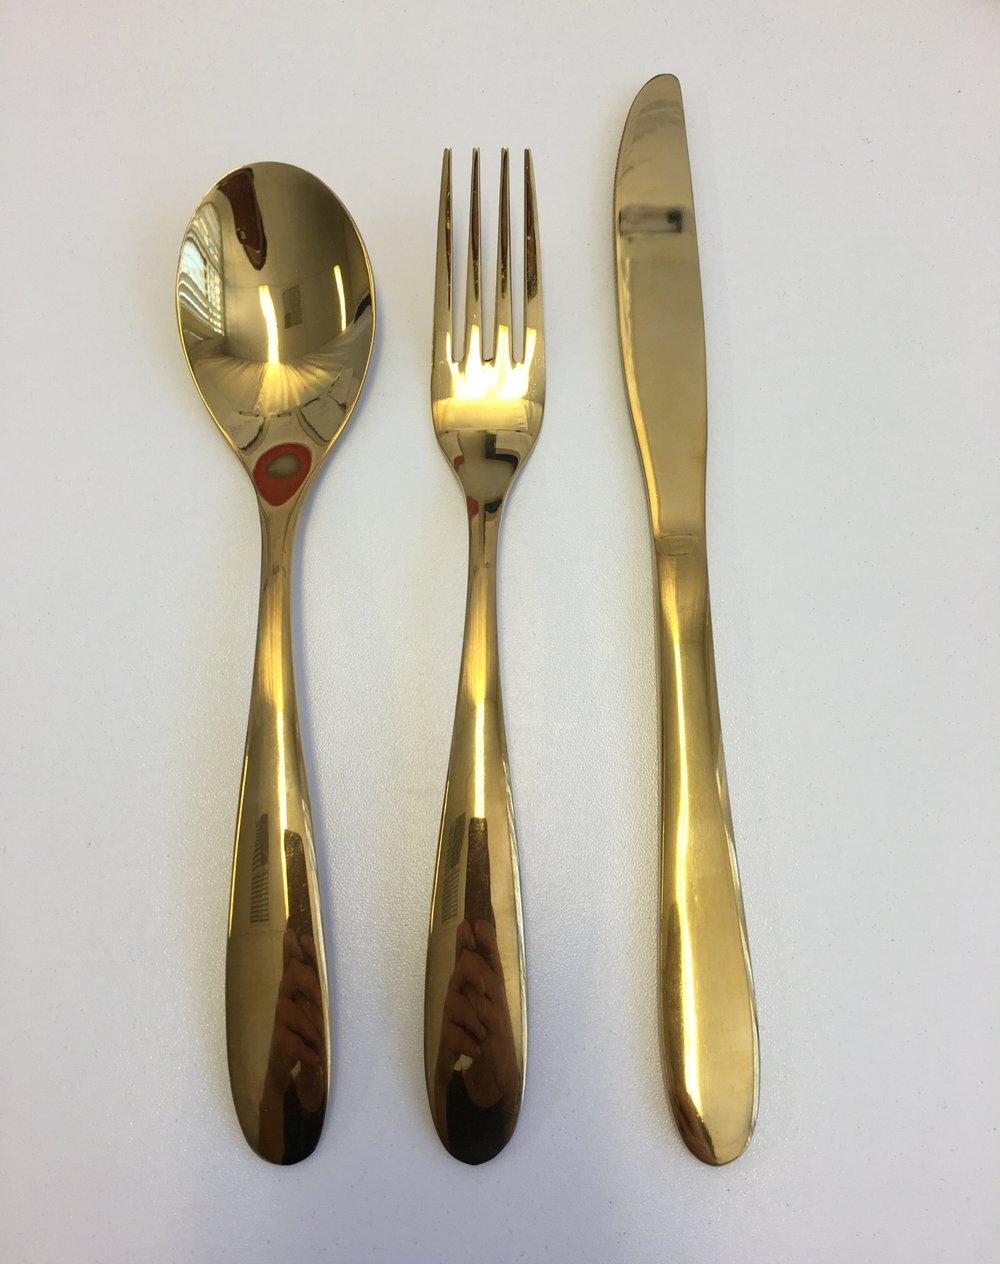 Gold Cutlery-2.JPG